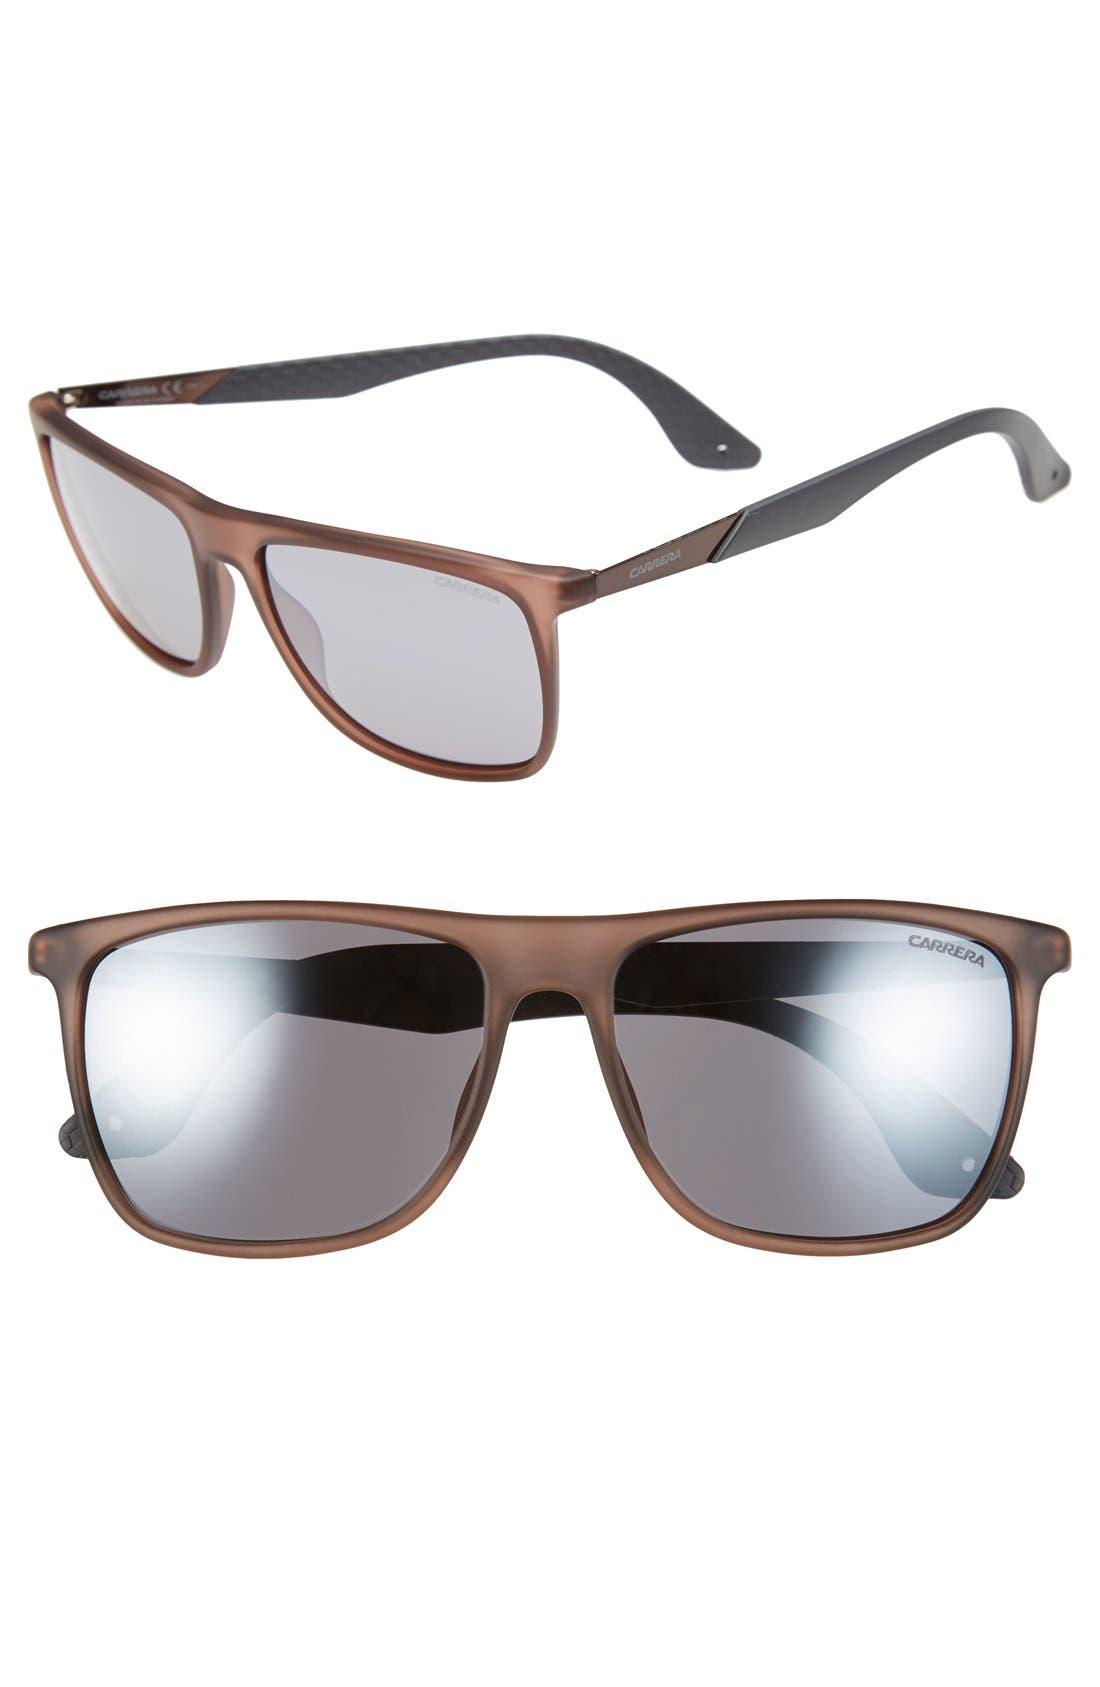 Main Image - Carrera Eyewear 56mm Retro Sunglasses